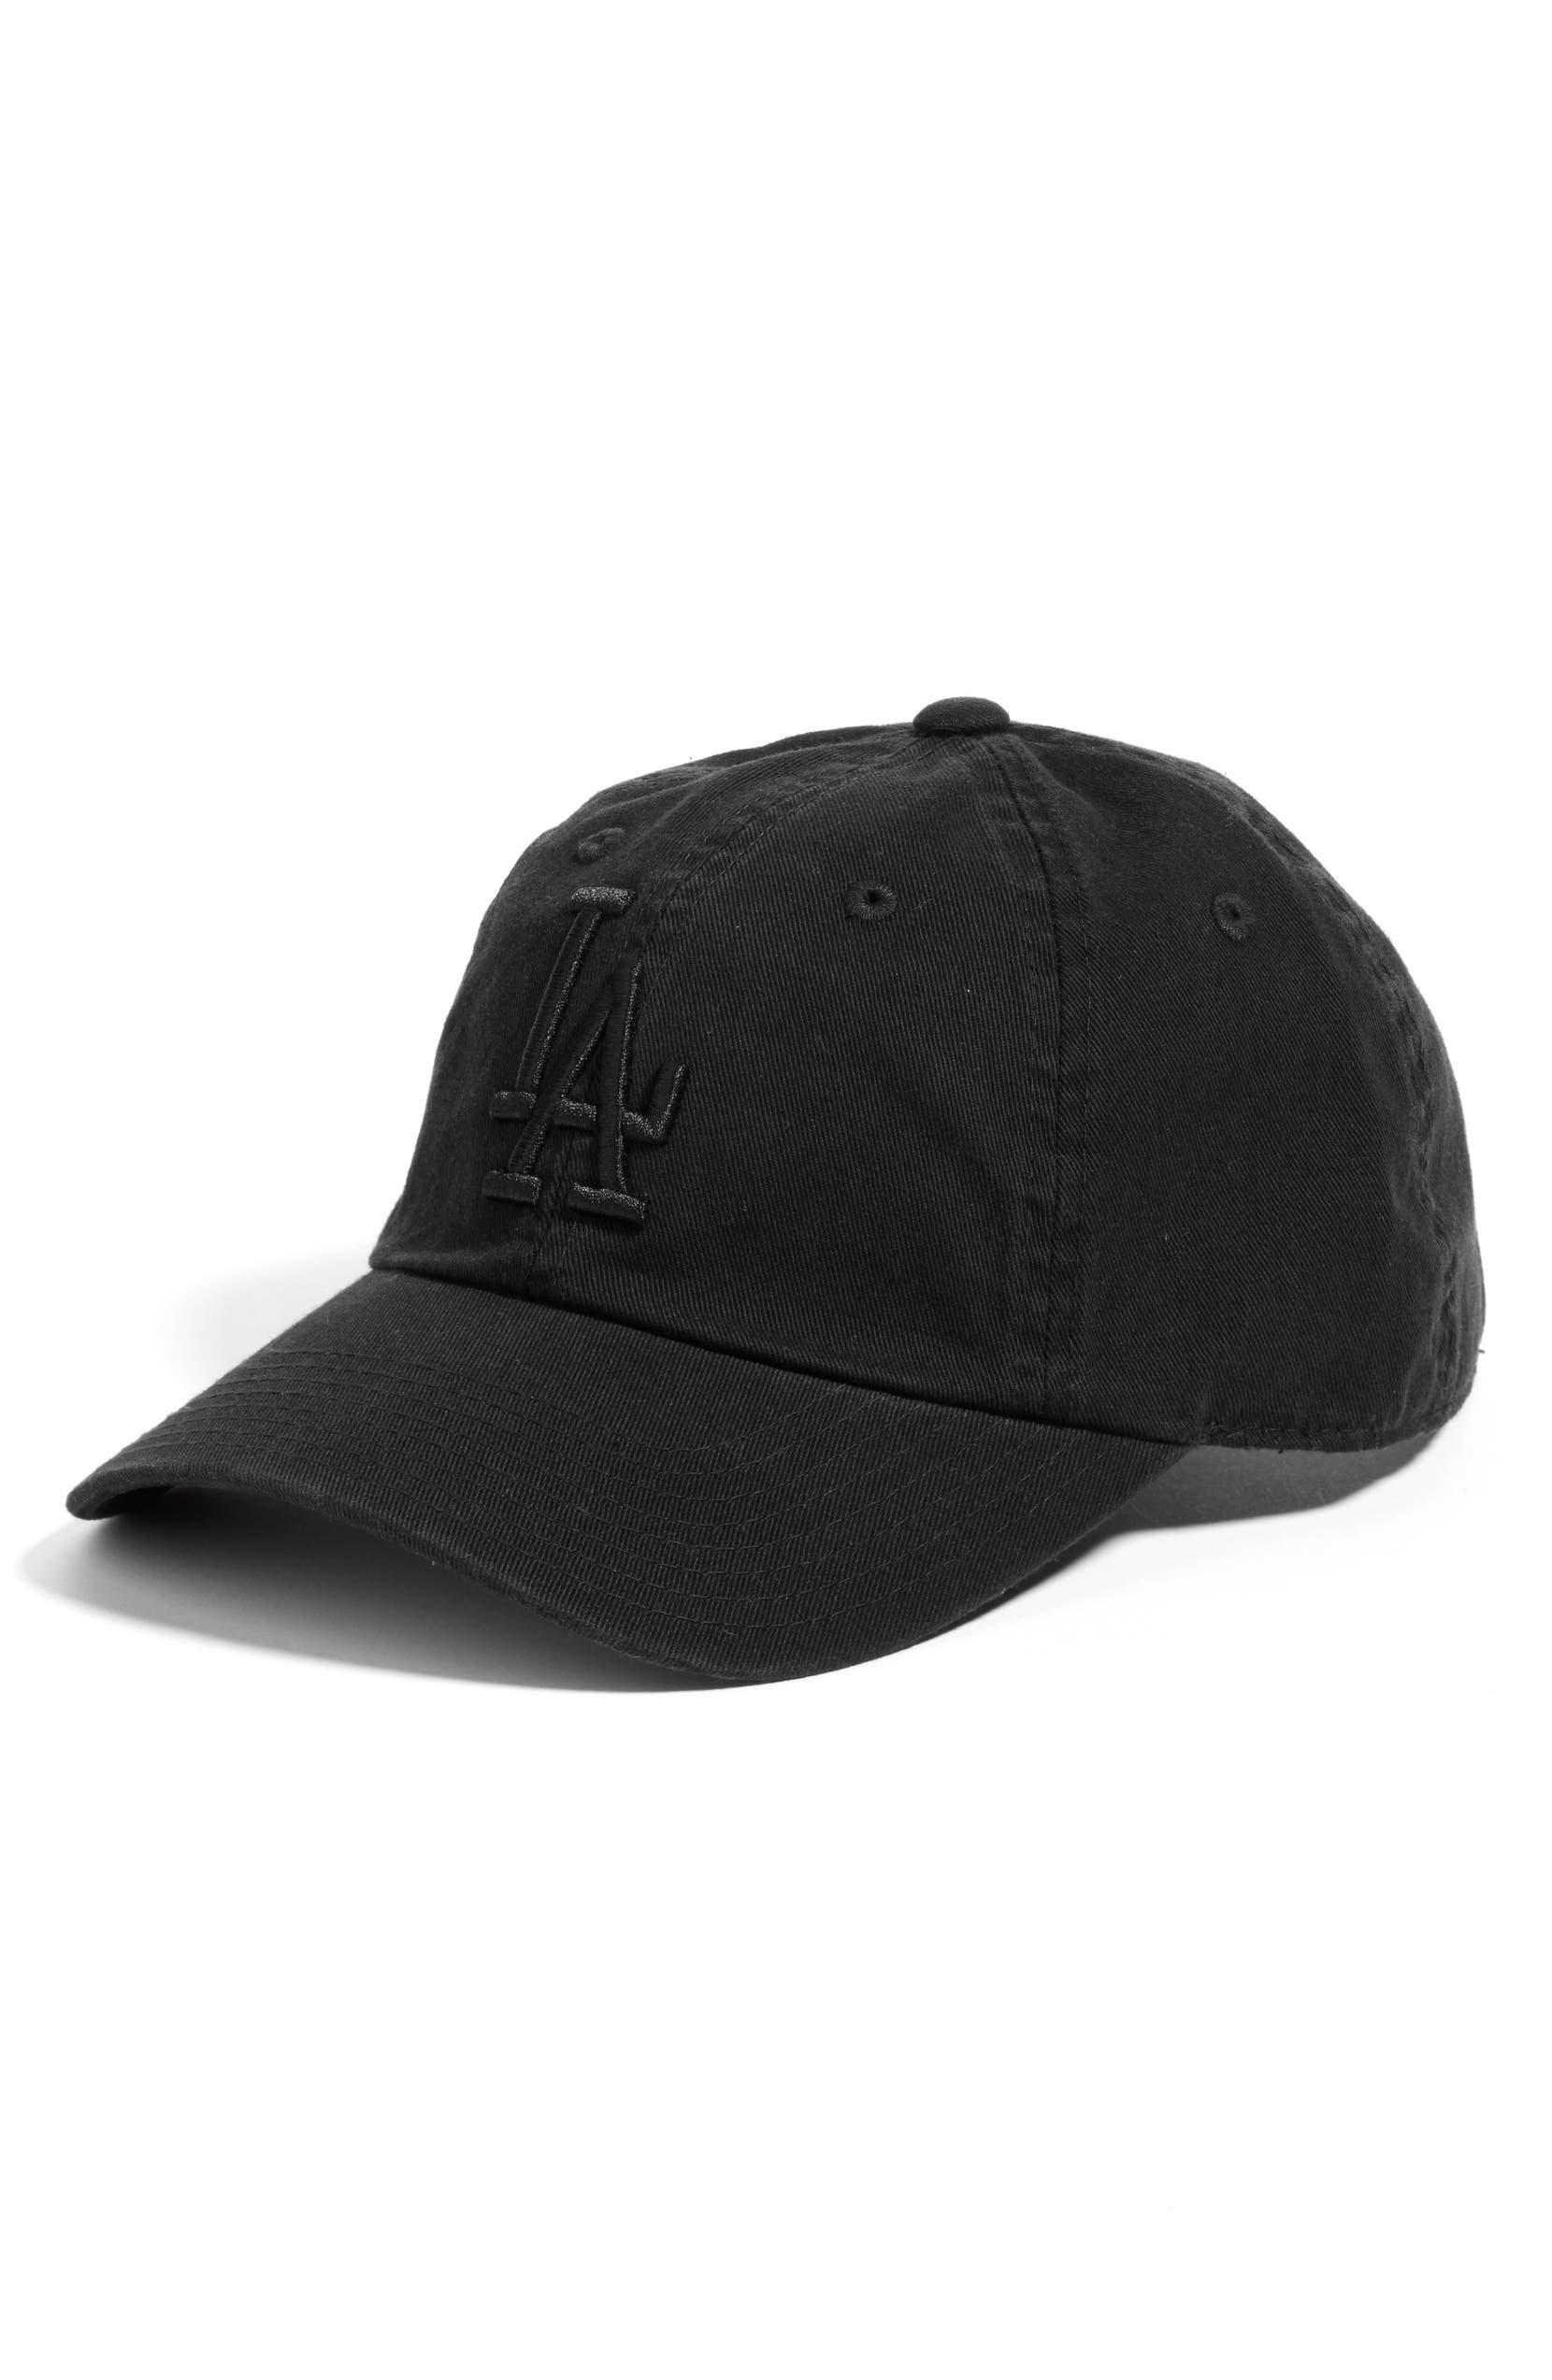 0053b0d5 Ballpark - Los Angeles Dodgers Baseball Cap